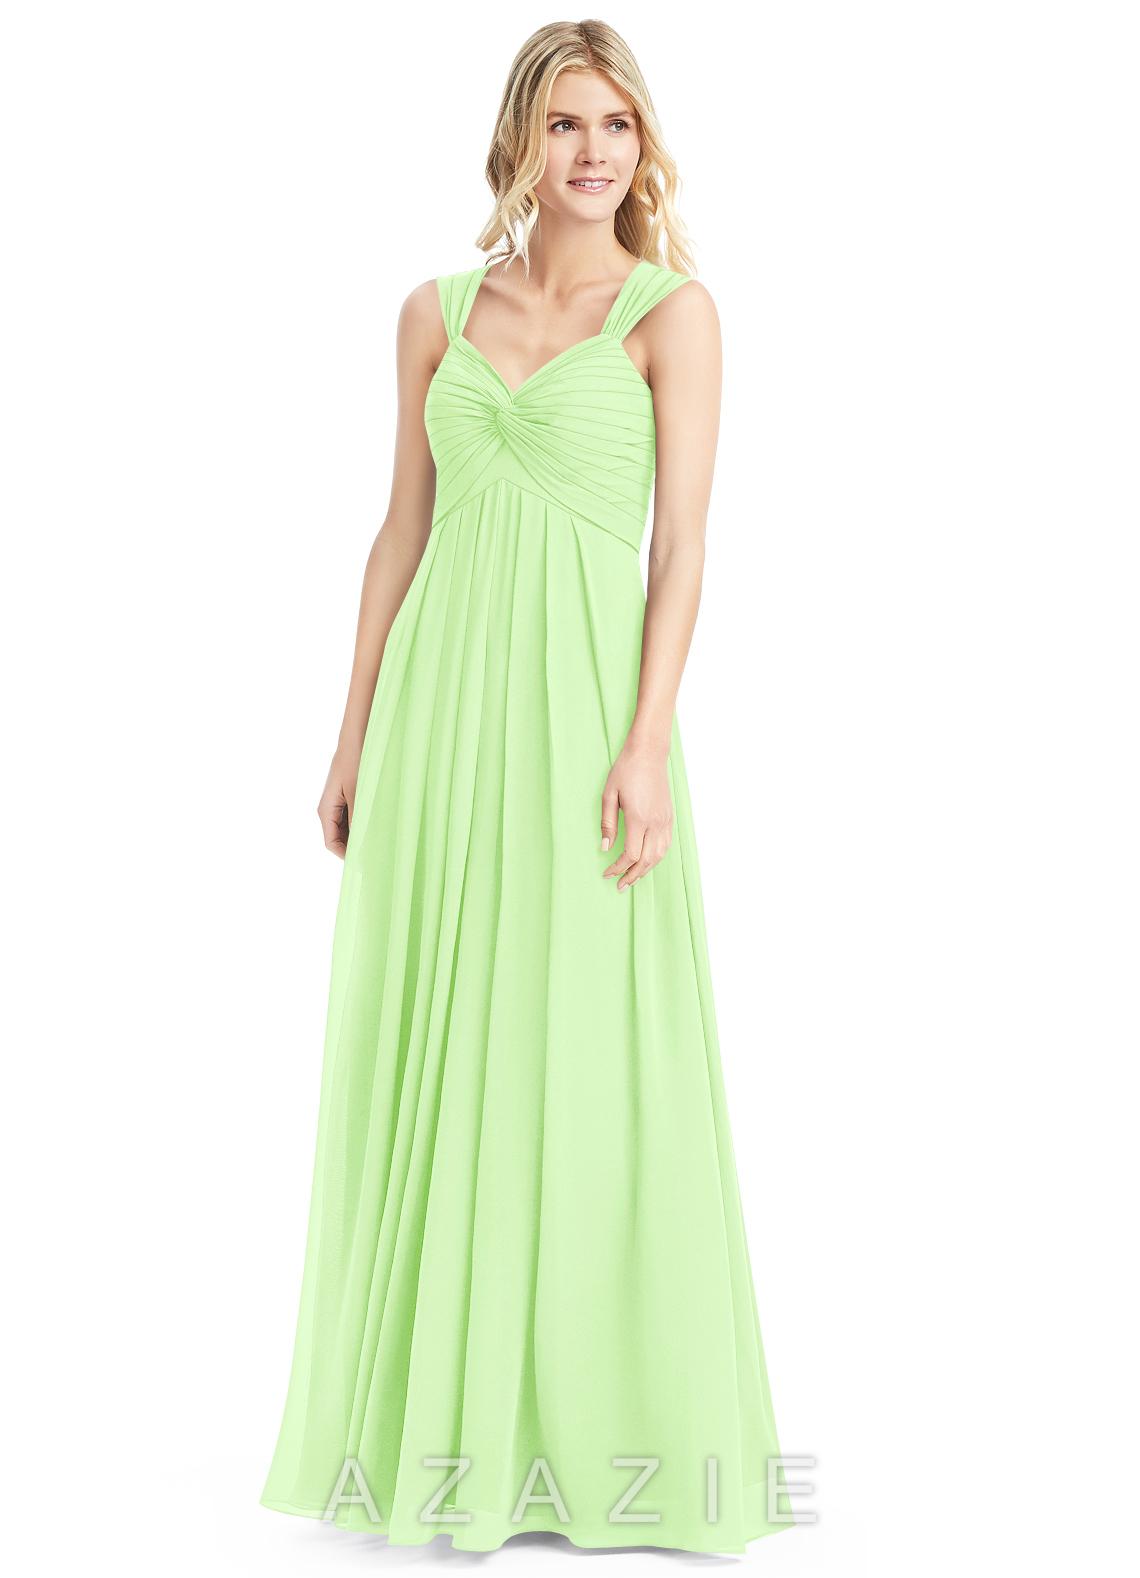 Azazie kaitlynn bridesmaid dress azazie loading zoom ombrellifo Images